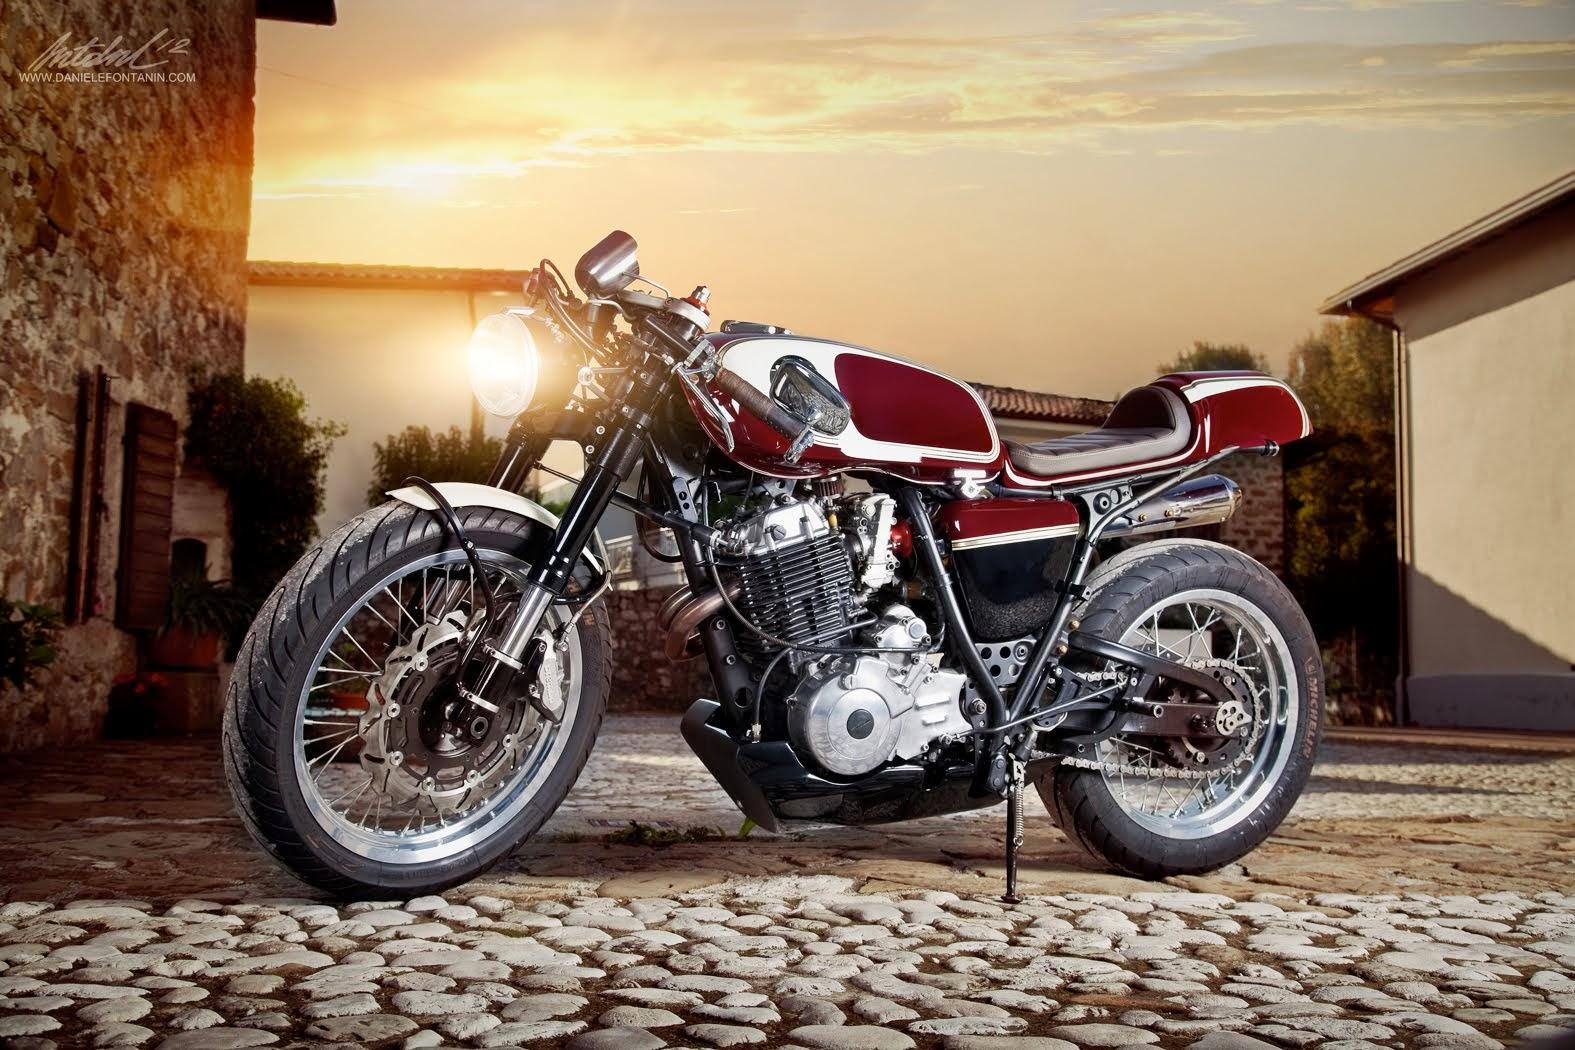 Yamaha tenere 600 cafe racer by plan b motorcycles lsr bikes for Moto regalasi